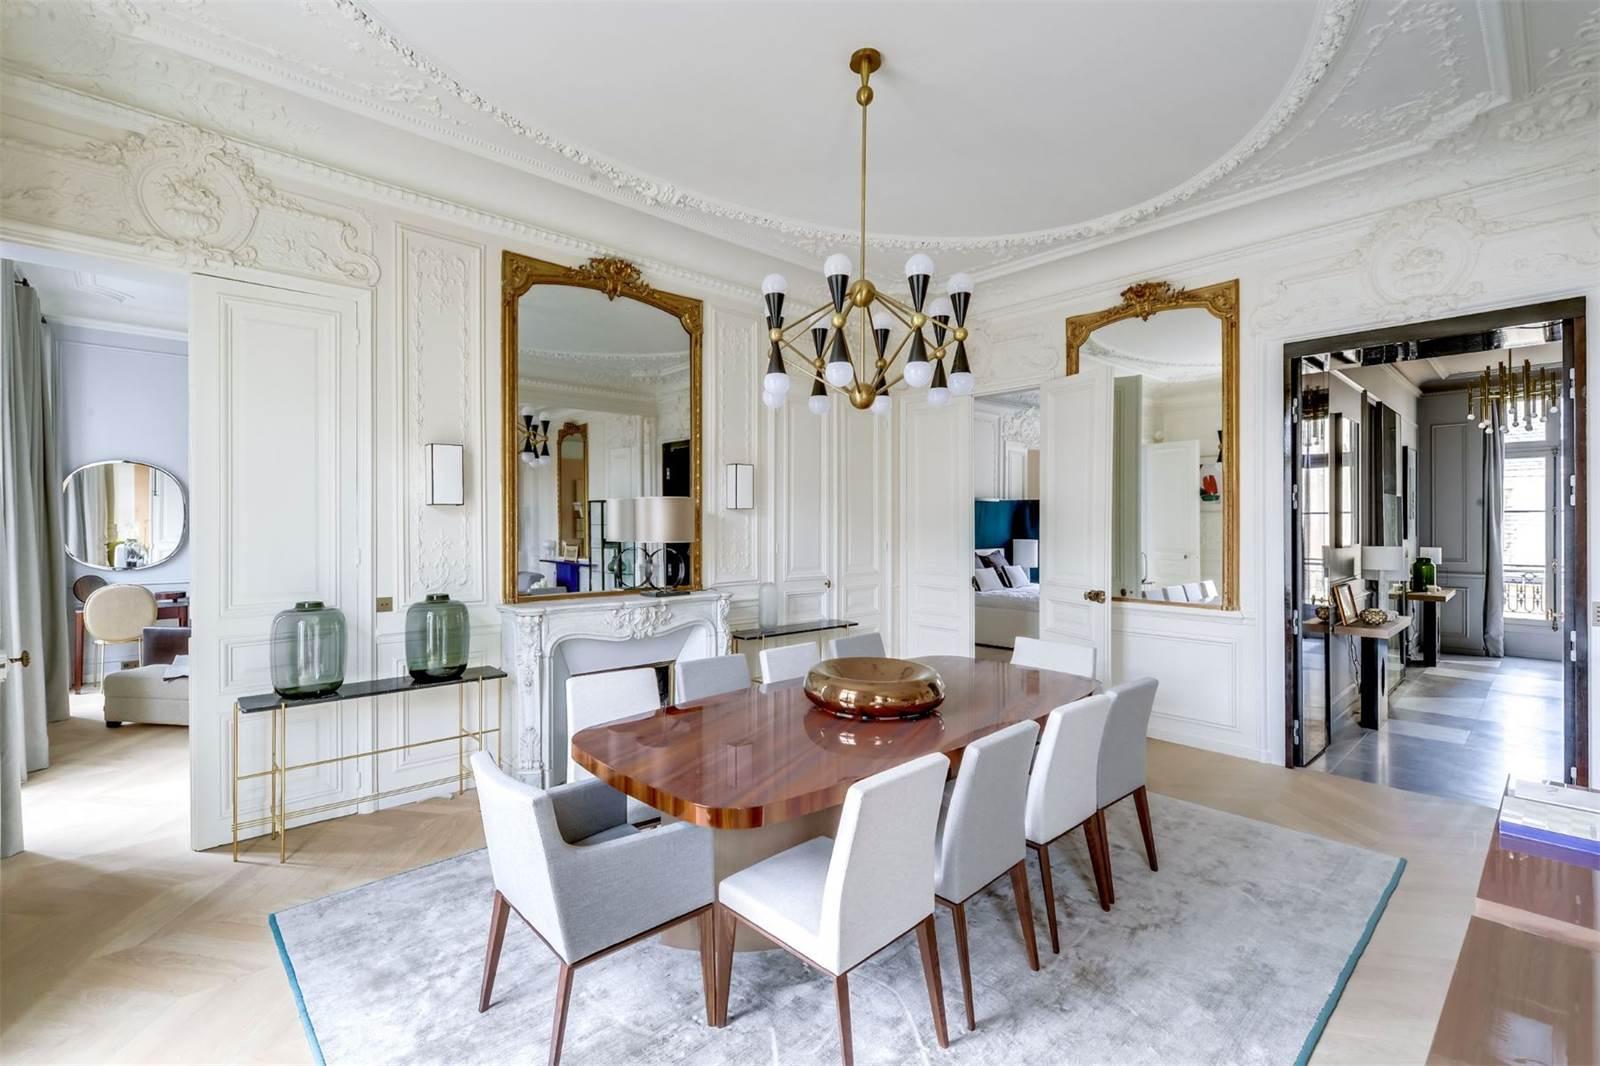 Classic Parisian Apartment Modern Twist | COCOCOZY